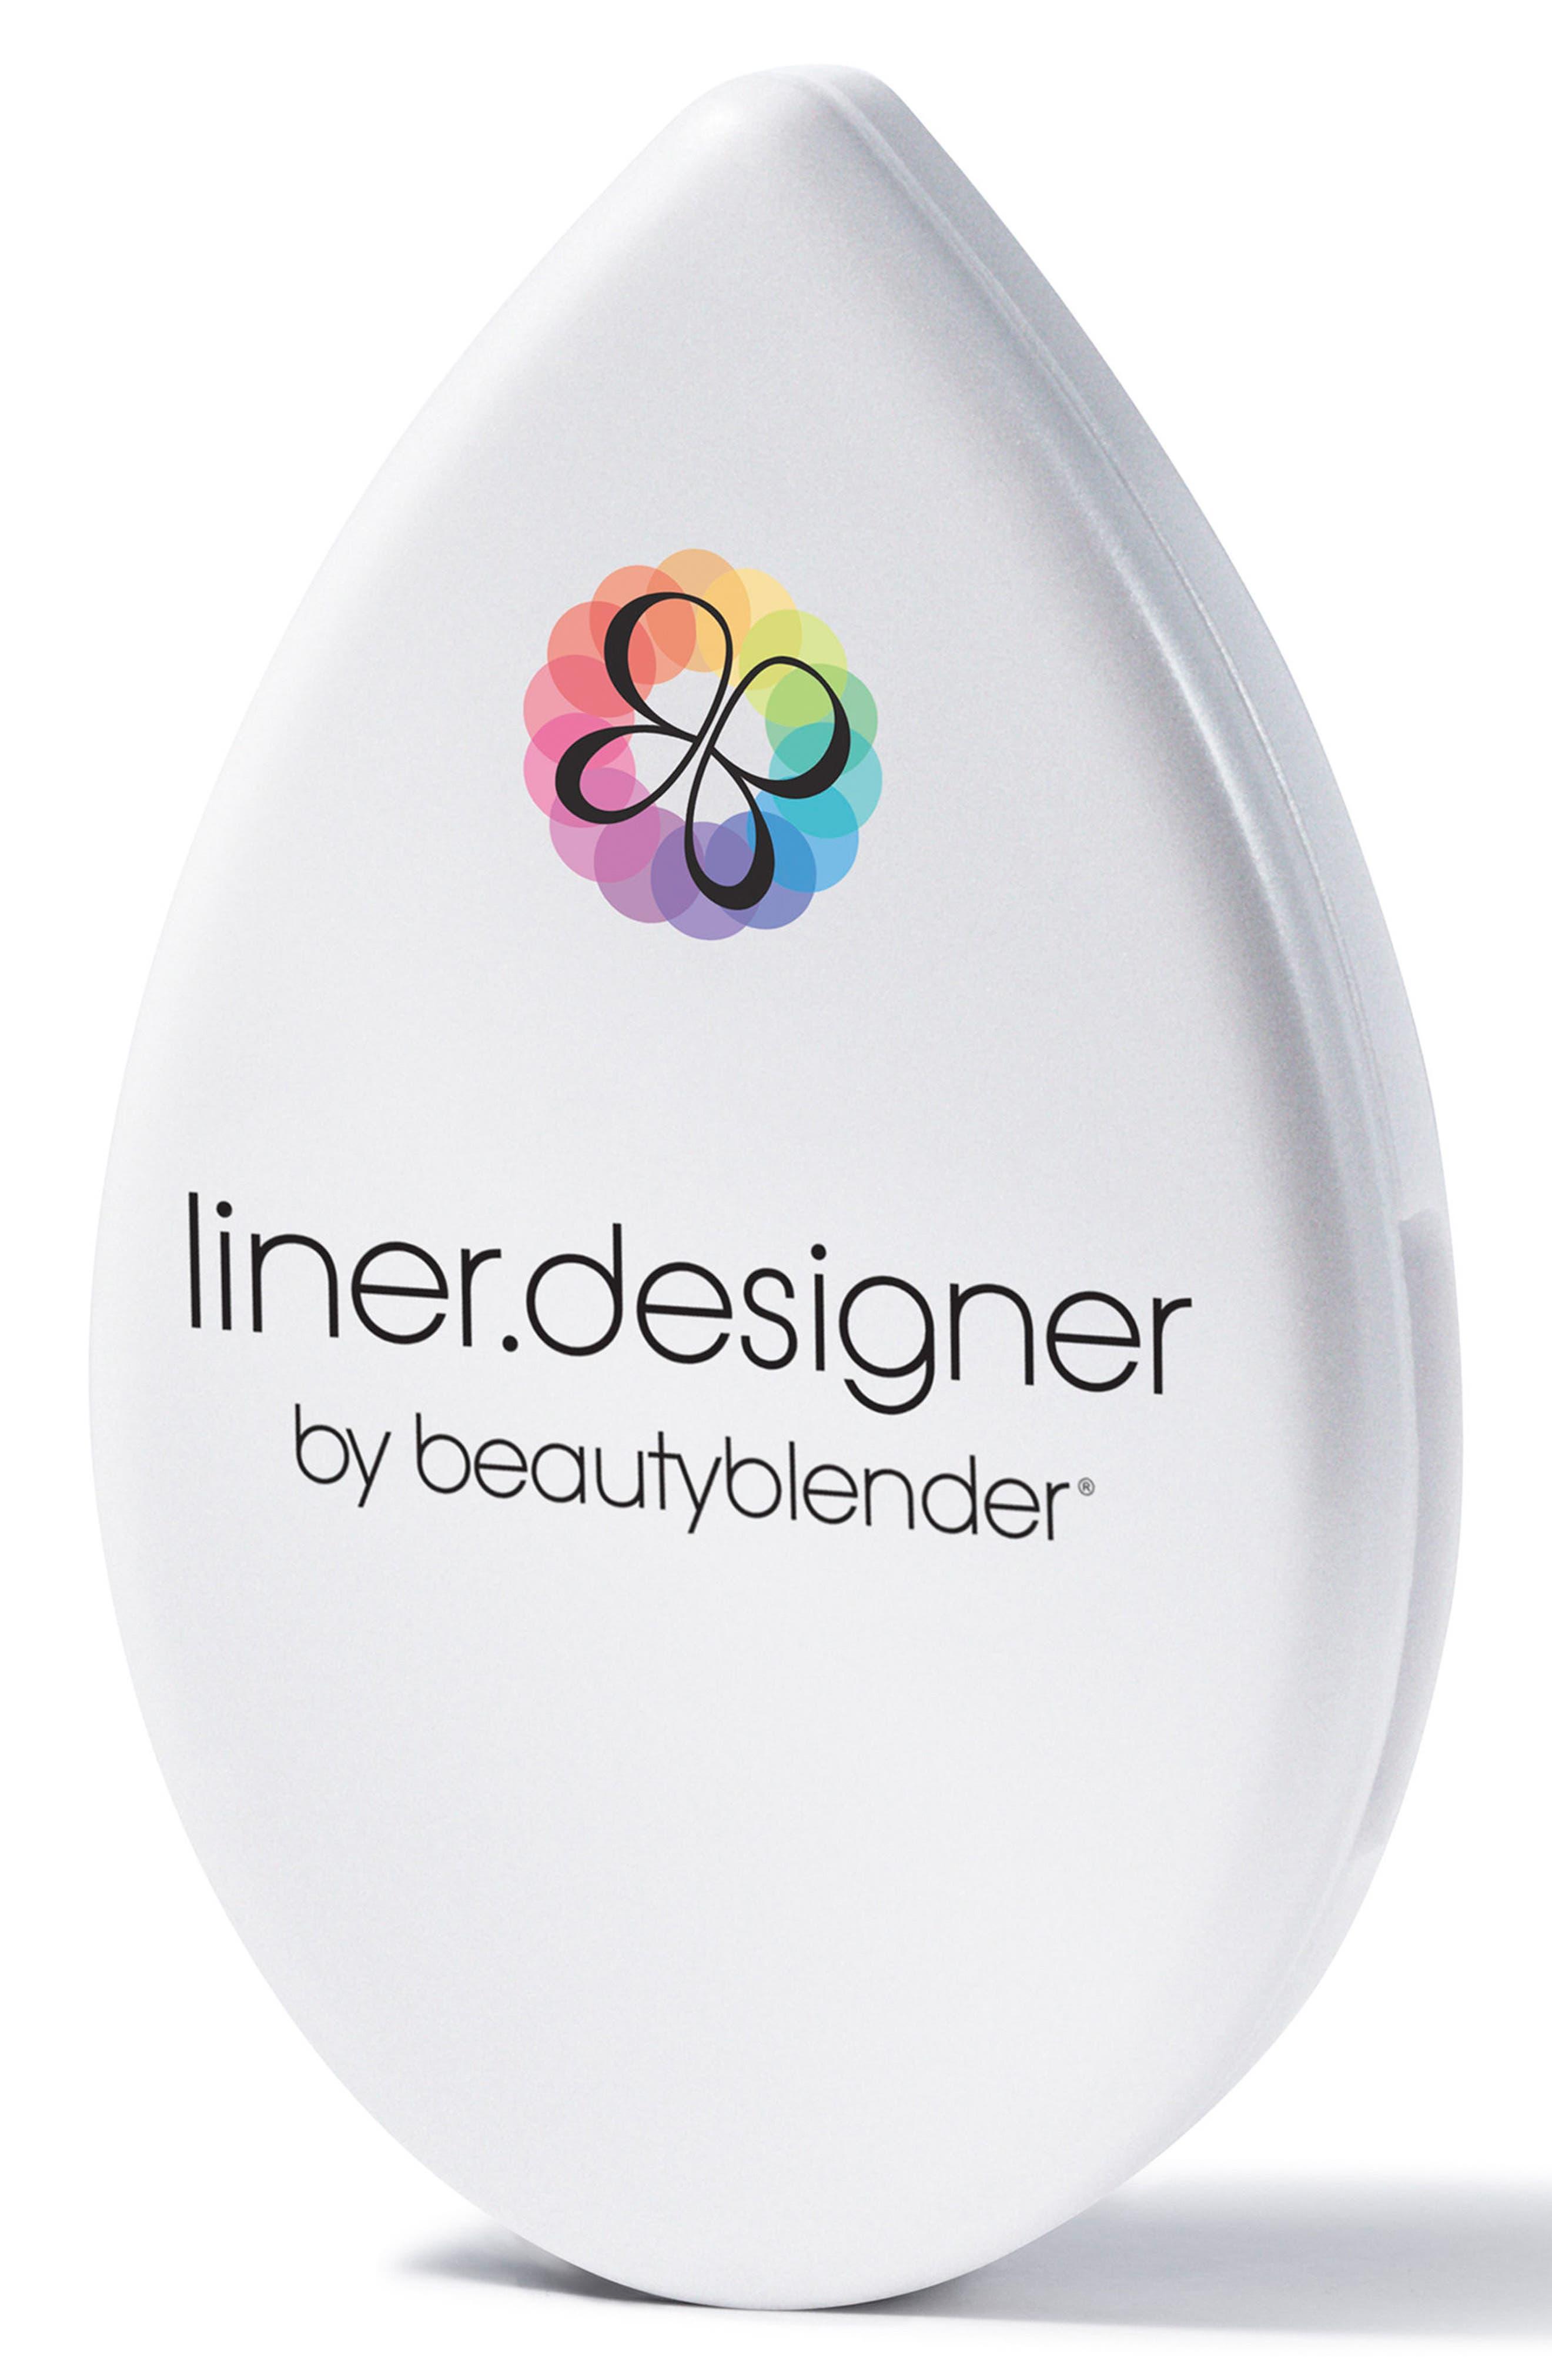 'liner.designer' Eyeliner Application Tool & Compact,                             Alternate thumbnail 2, color,                             NO COLOR